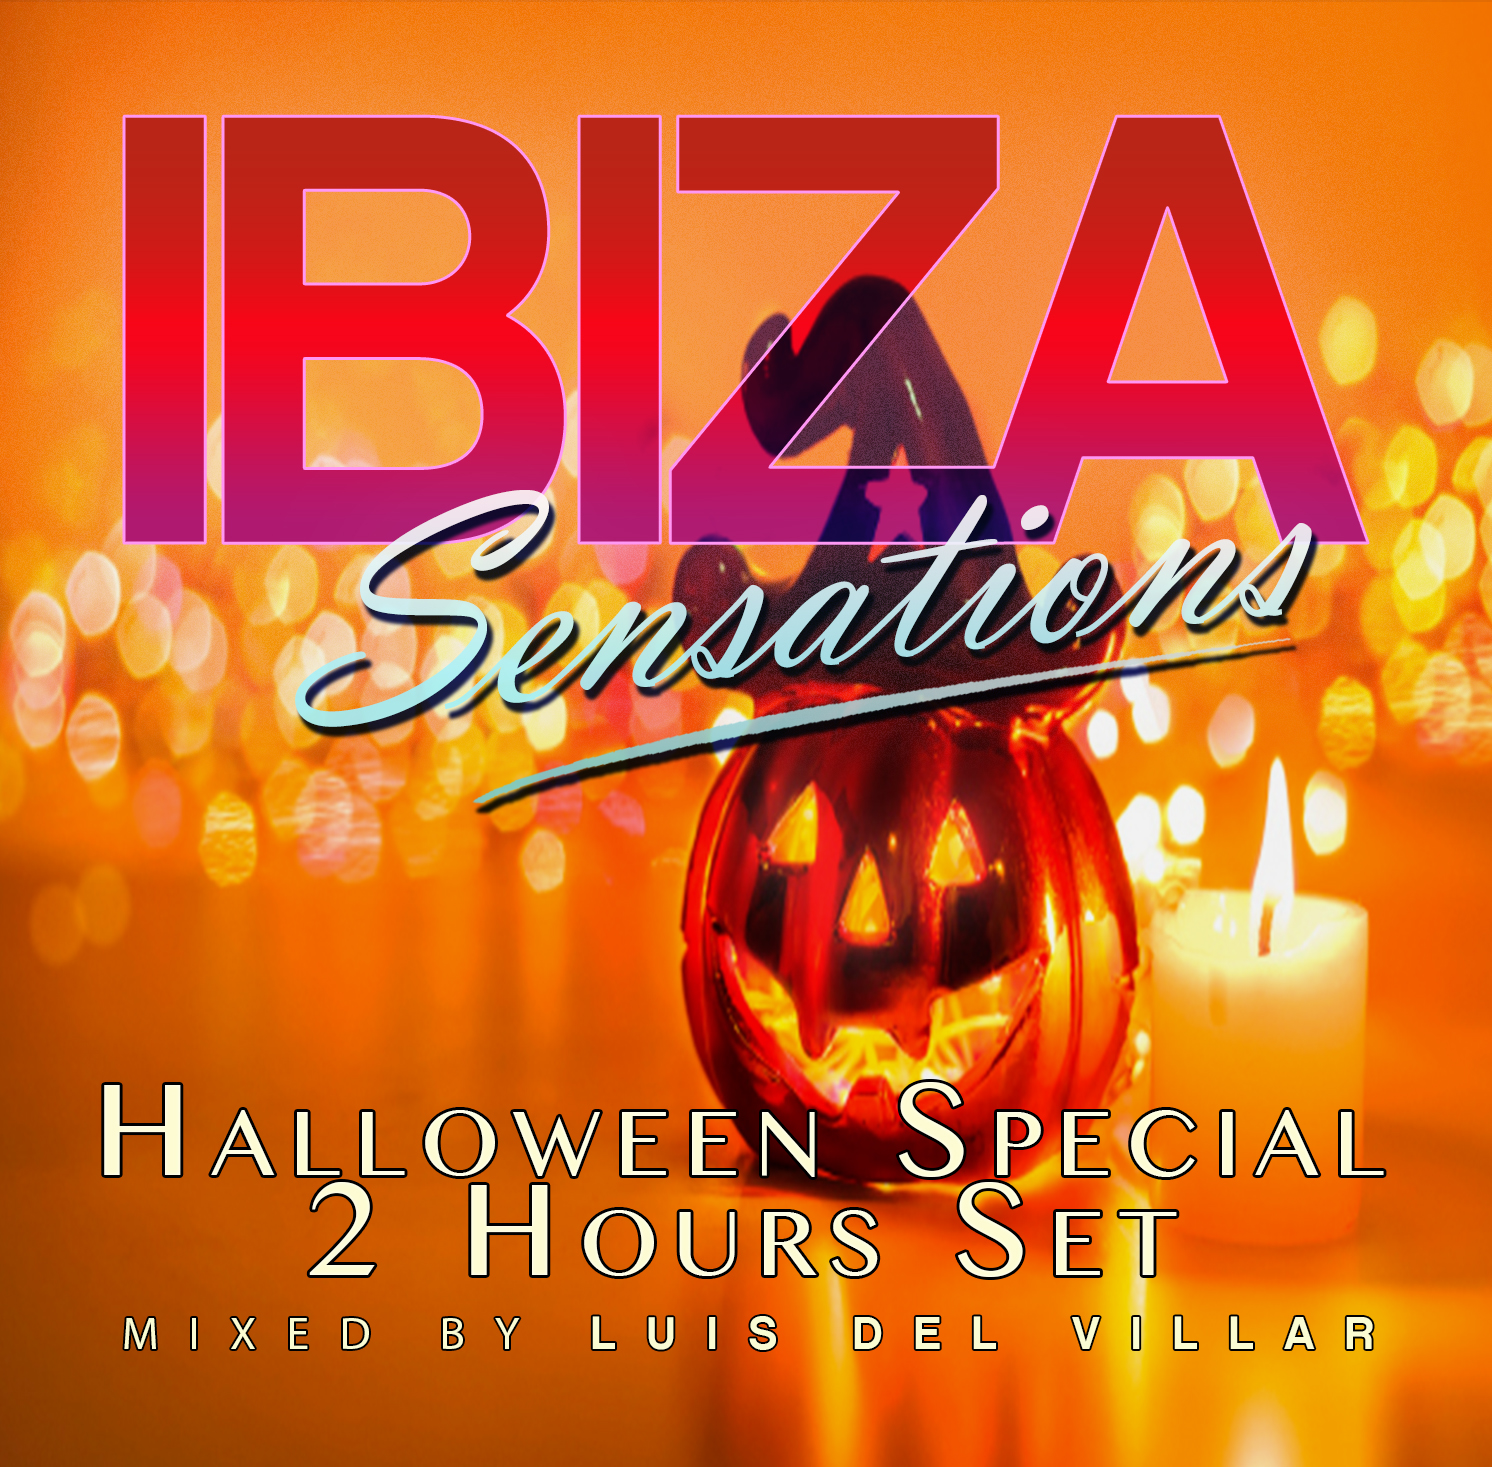 Artwork for Ibiza Sensations 126 Halloween Special 2 Hours Set